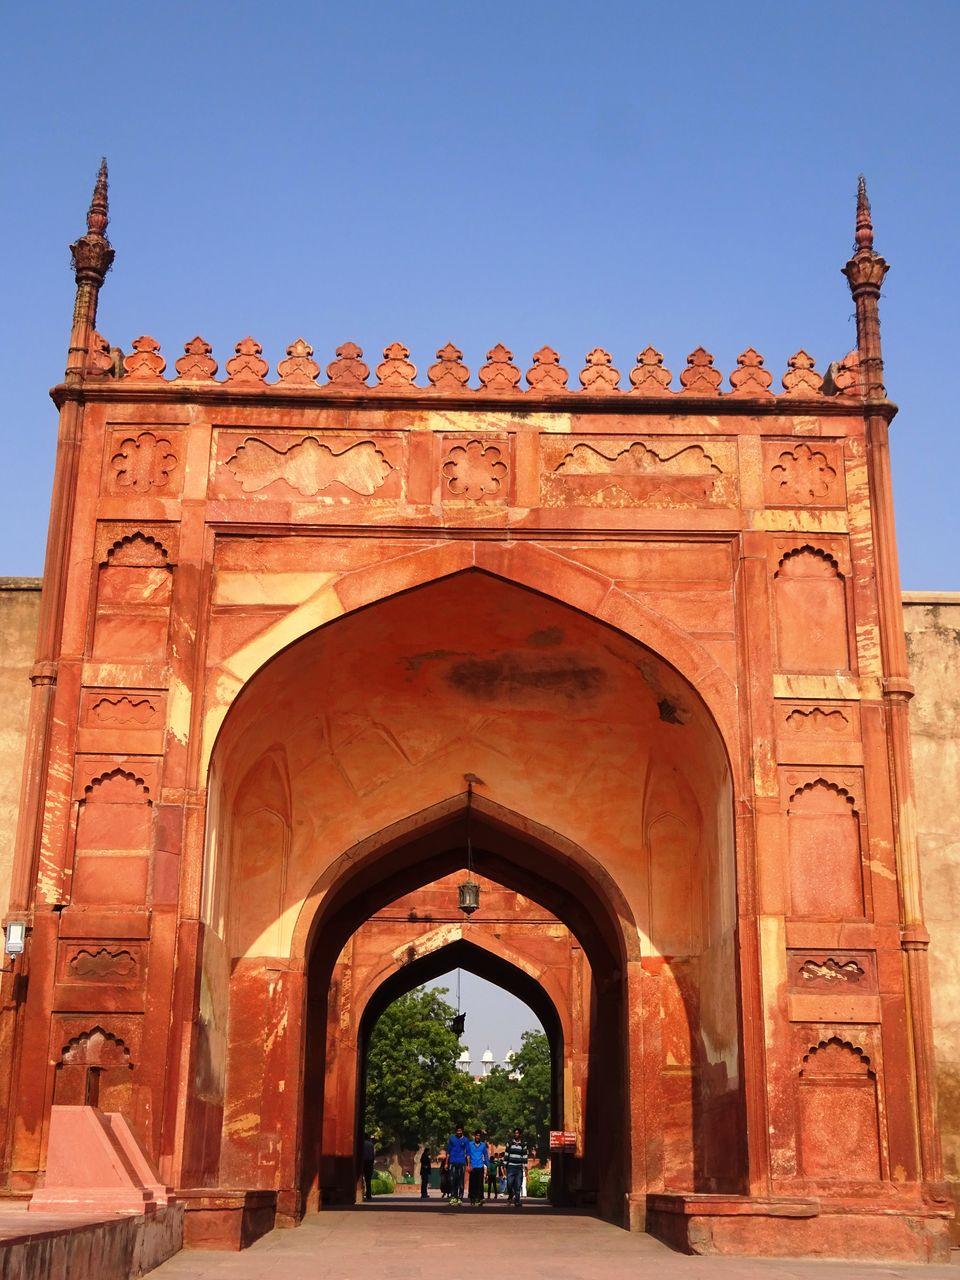 Photos of Agra Fort, Agra, Uttar Pradesh, India 1/4 by Prahlad Raj